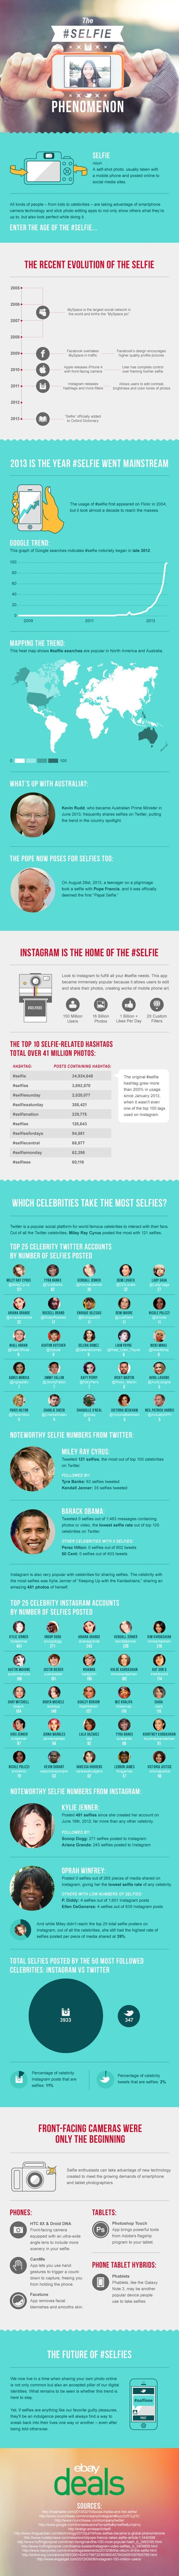 selfie cameras infographic - 7859726080